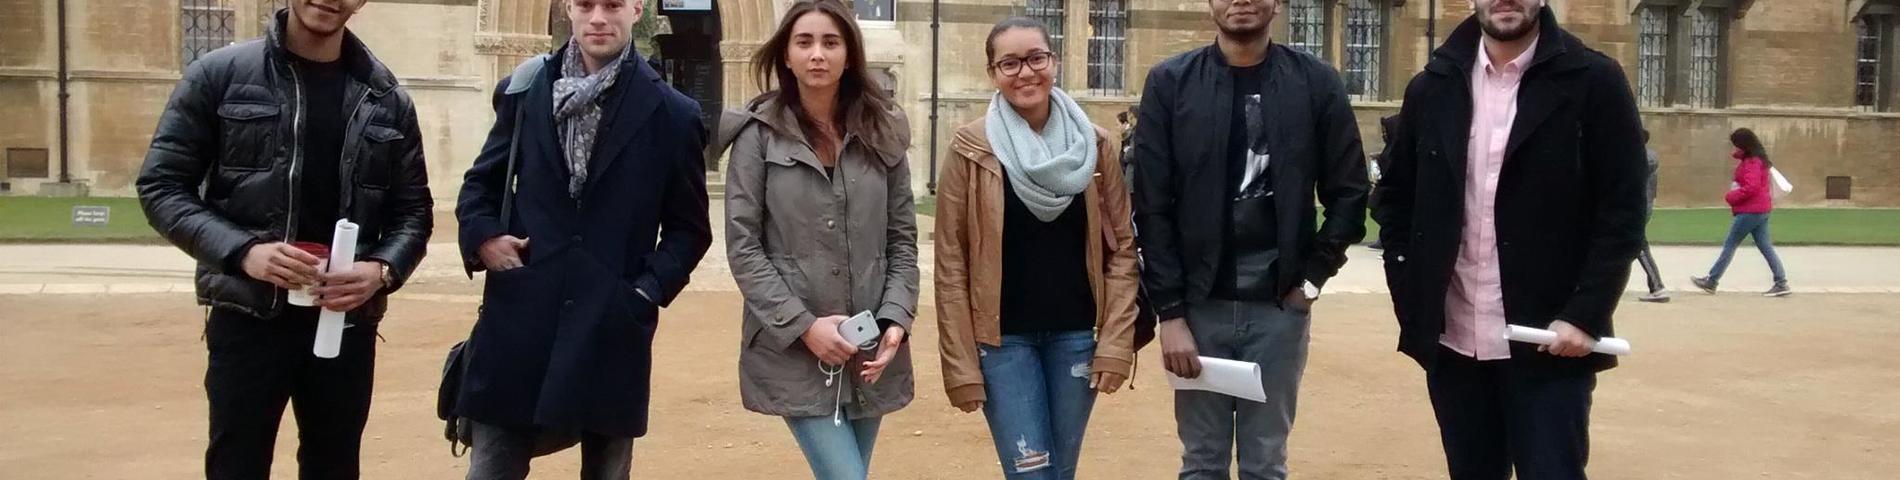 Oxford International Study Centre bild 1